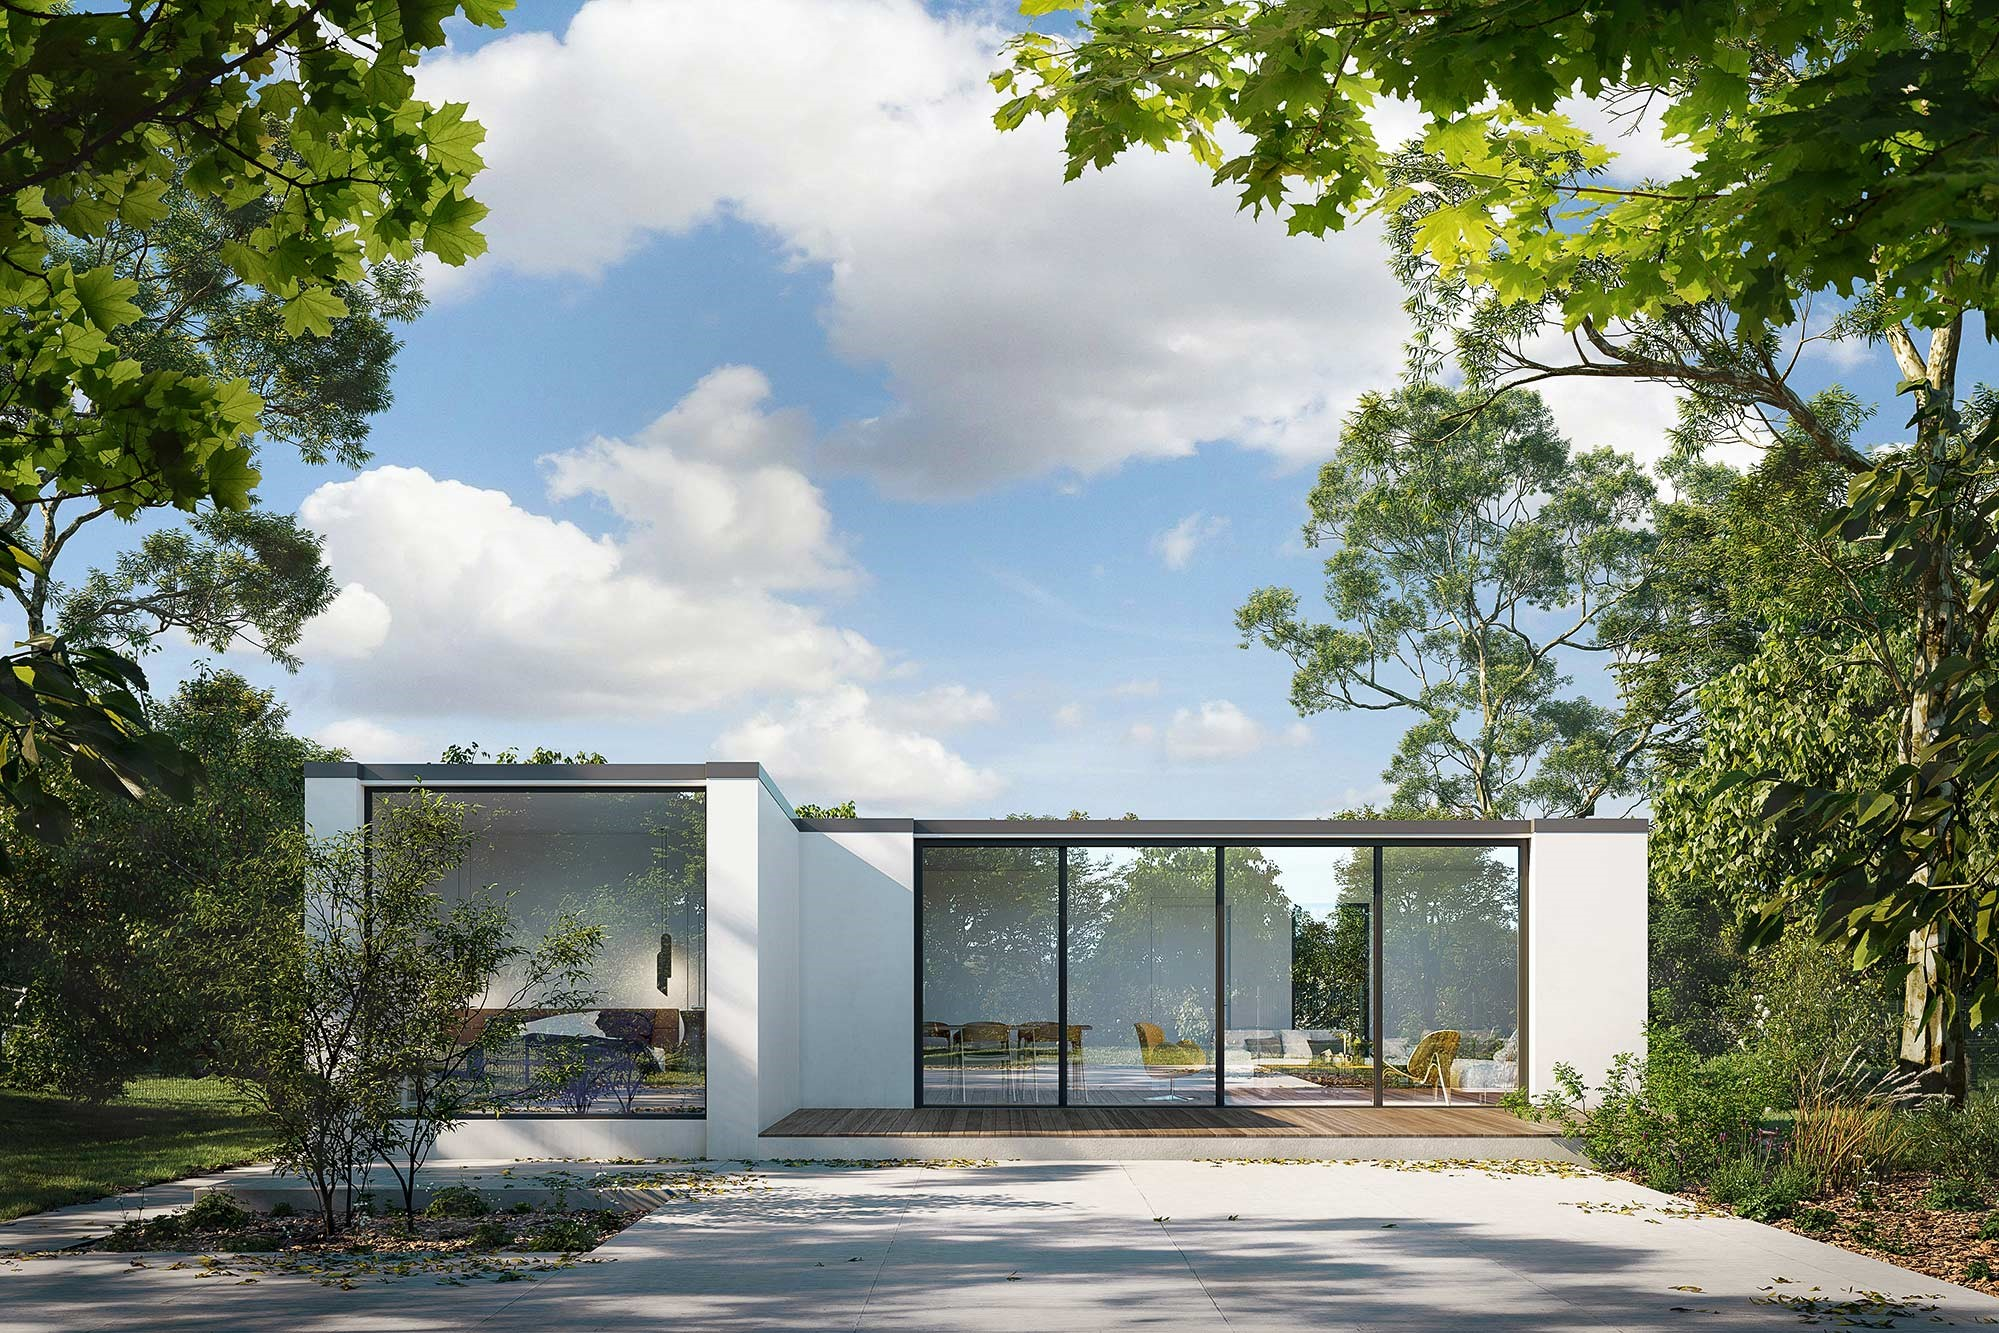 diy | Garden Studios